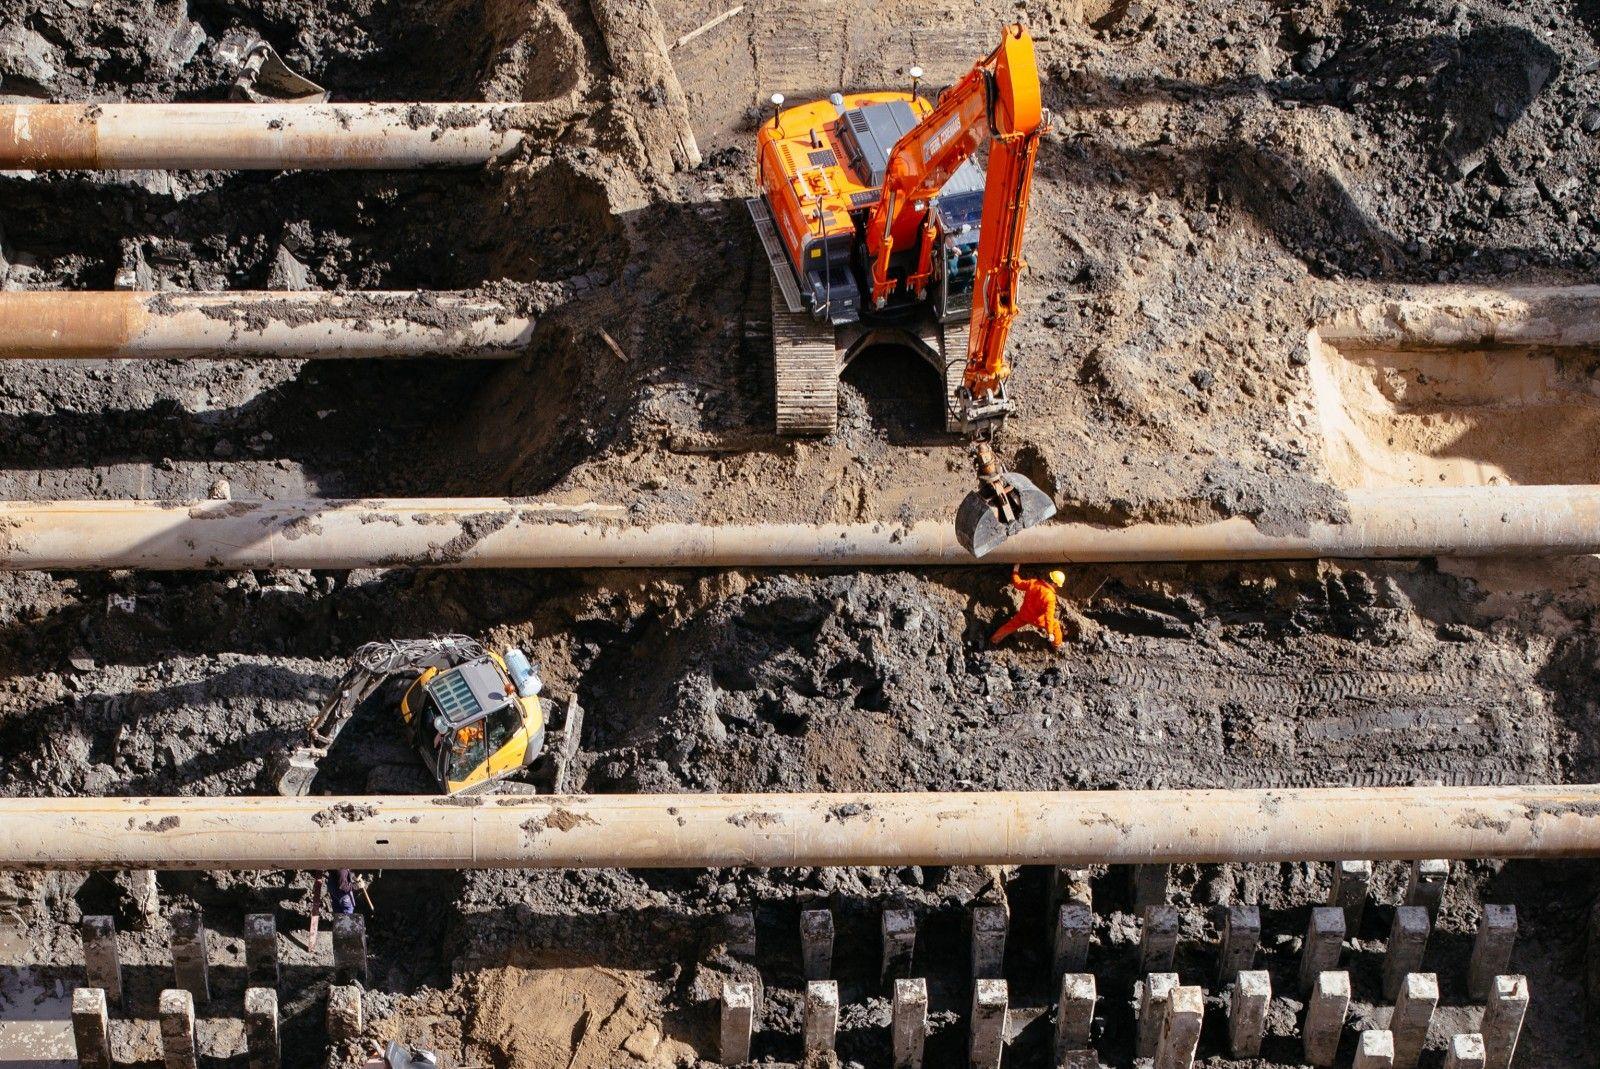 rotterdam_netherlands_construction_man_crane_boston_seattle_copyright_jipvankuijk_1